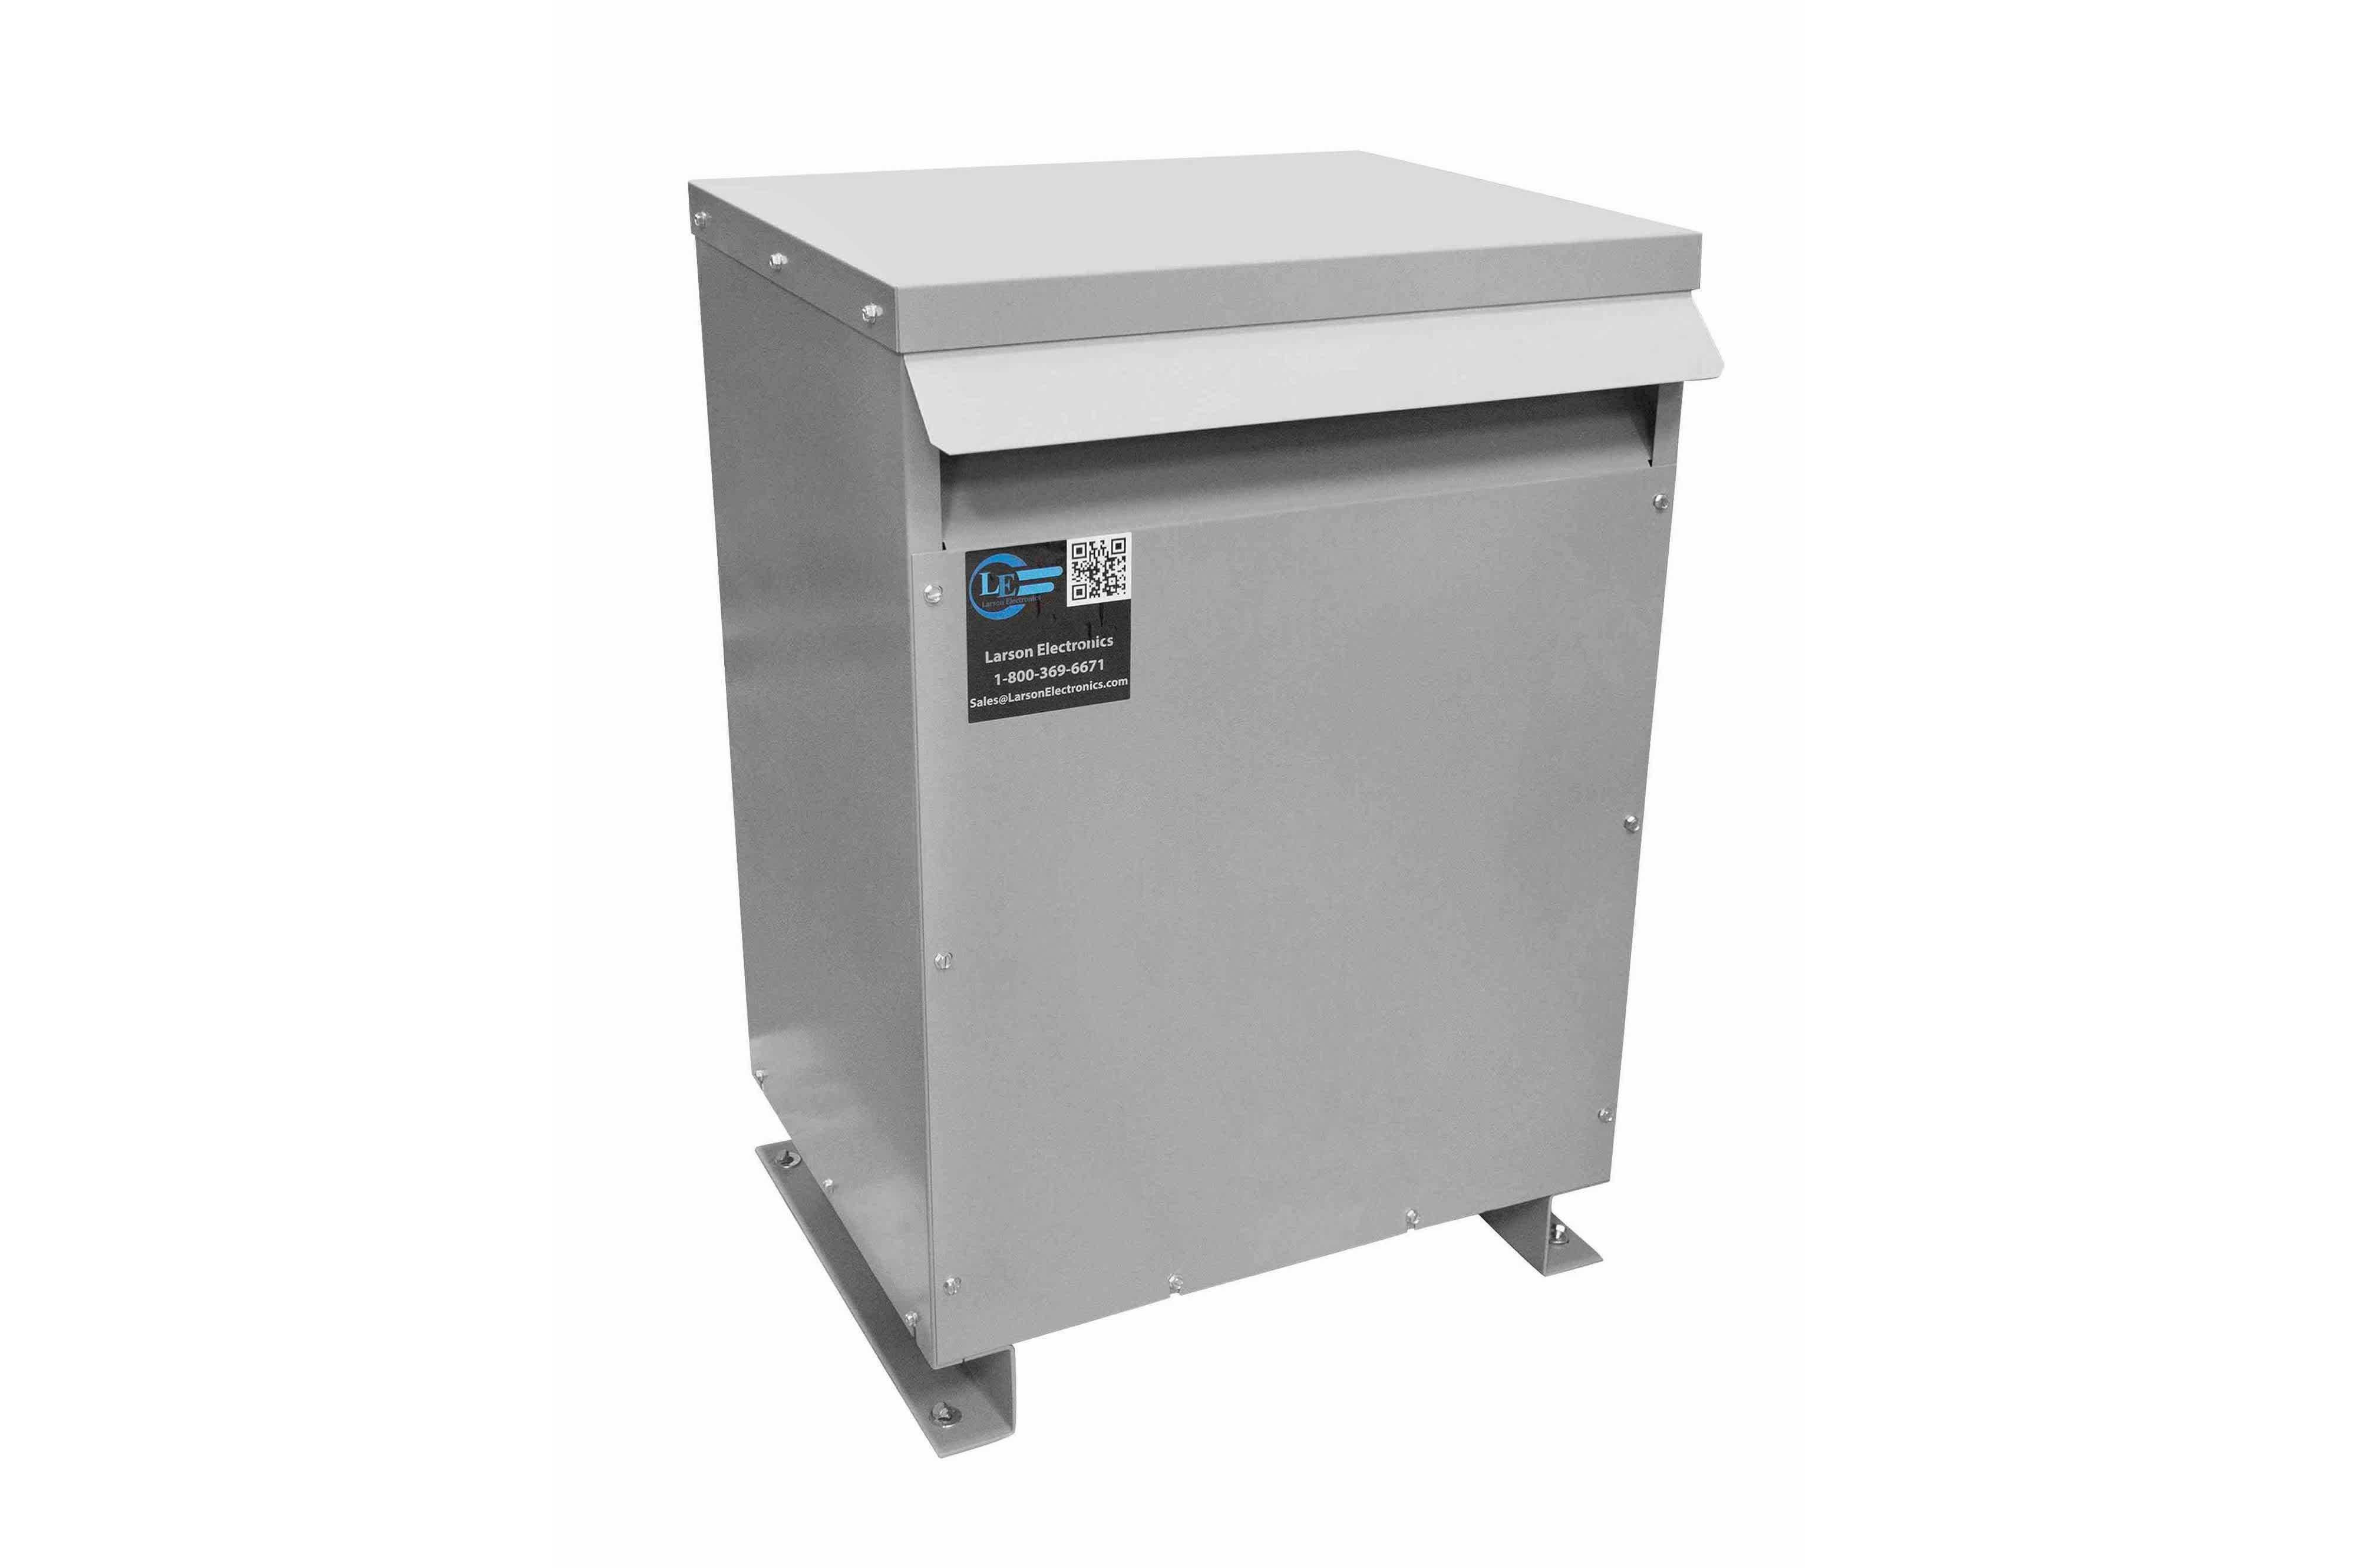 90 kVA 3PH Isolation Transformer, 208V Wye Primary, 380Y/220 Wye-N Secondary, N3R, Ventilated, 60 Hz